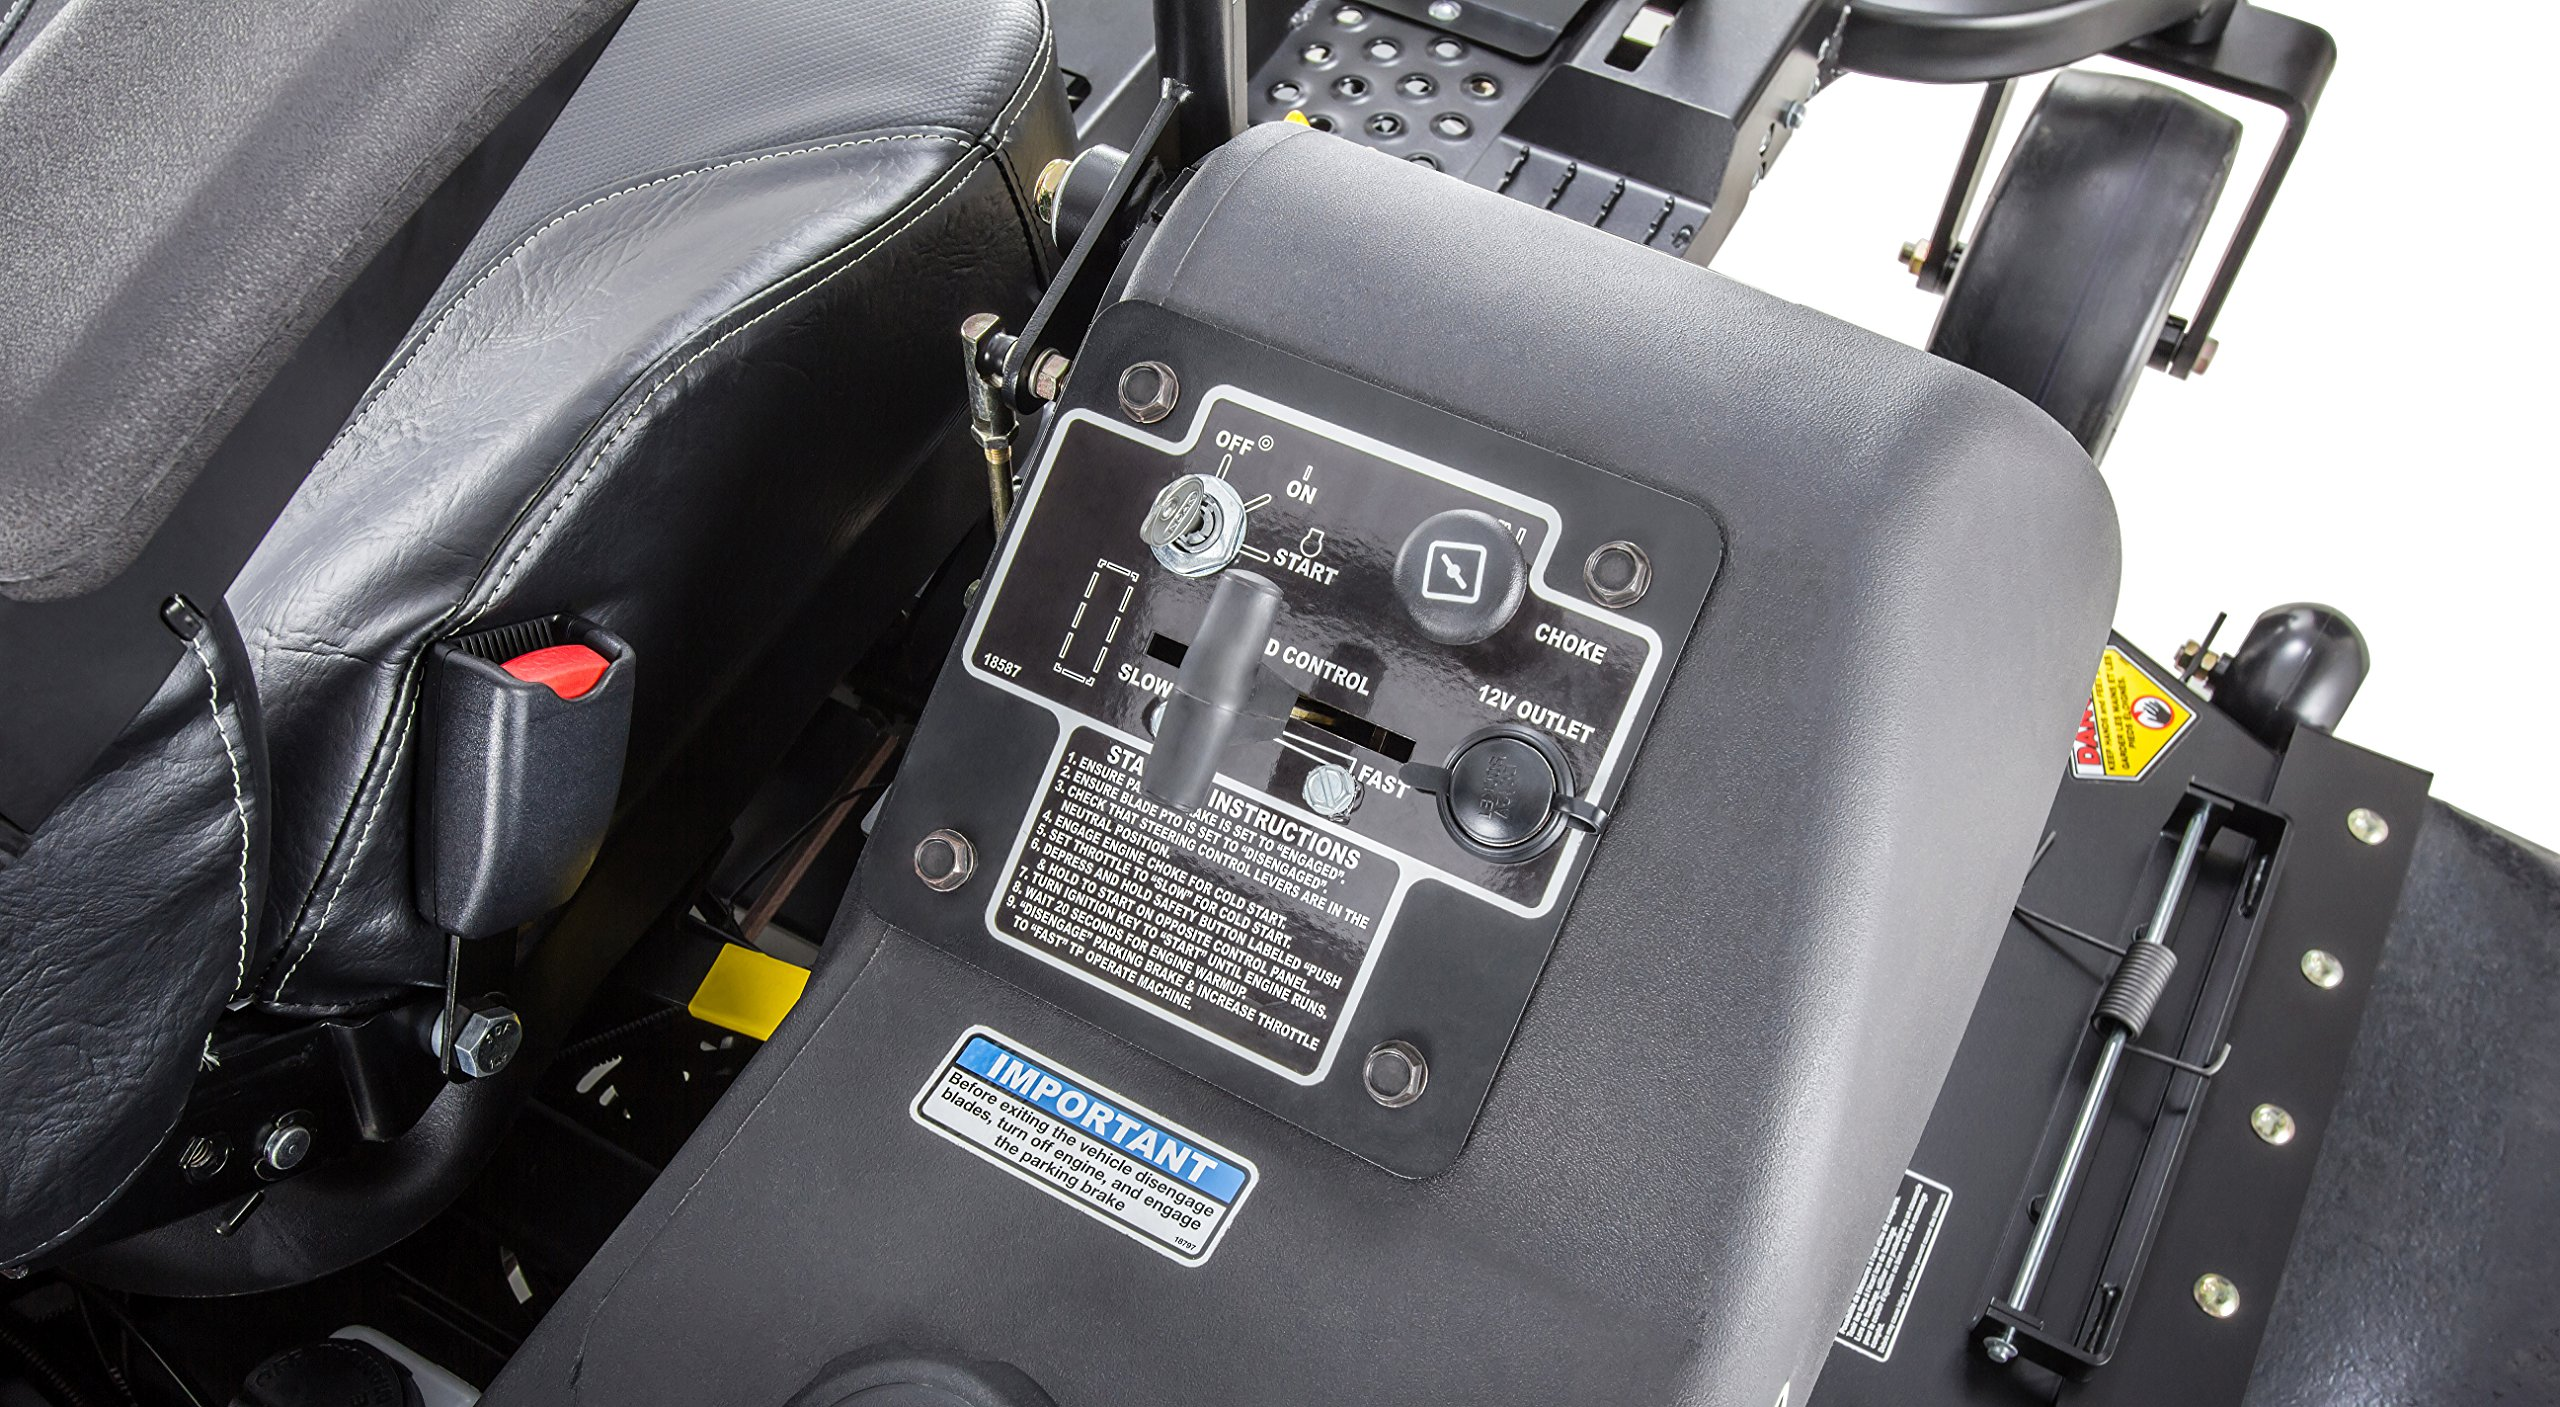 Swisher Z21554CPHO 21.5HP Reponse Gen 2 Honda Ztr Commercial Pro, Black, 54'' by Swisher (Image #14)